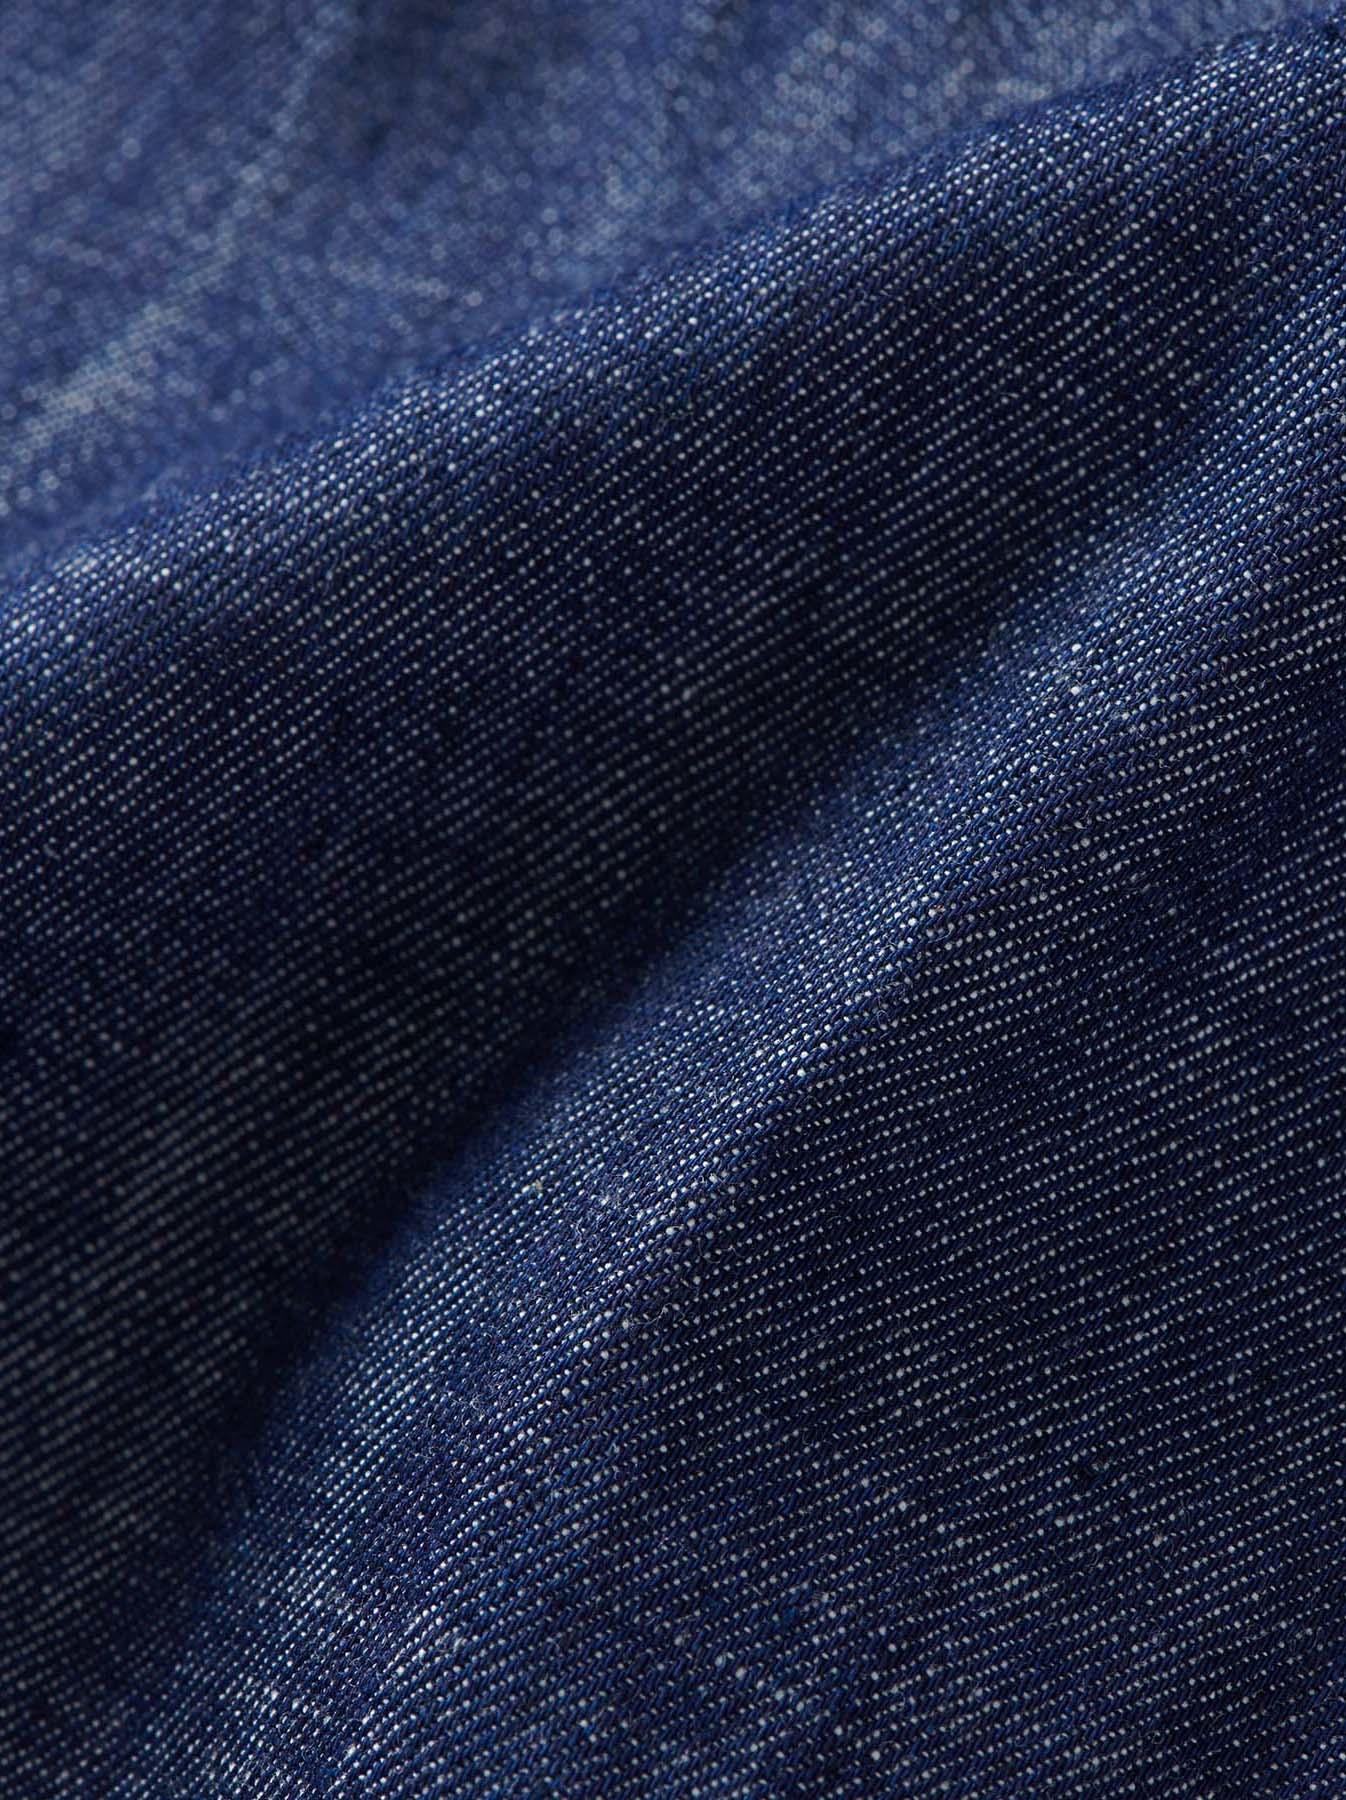 WH Goma Denim Umahiko Pullover Shirt-11